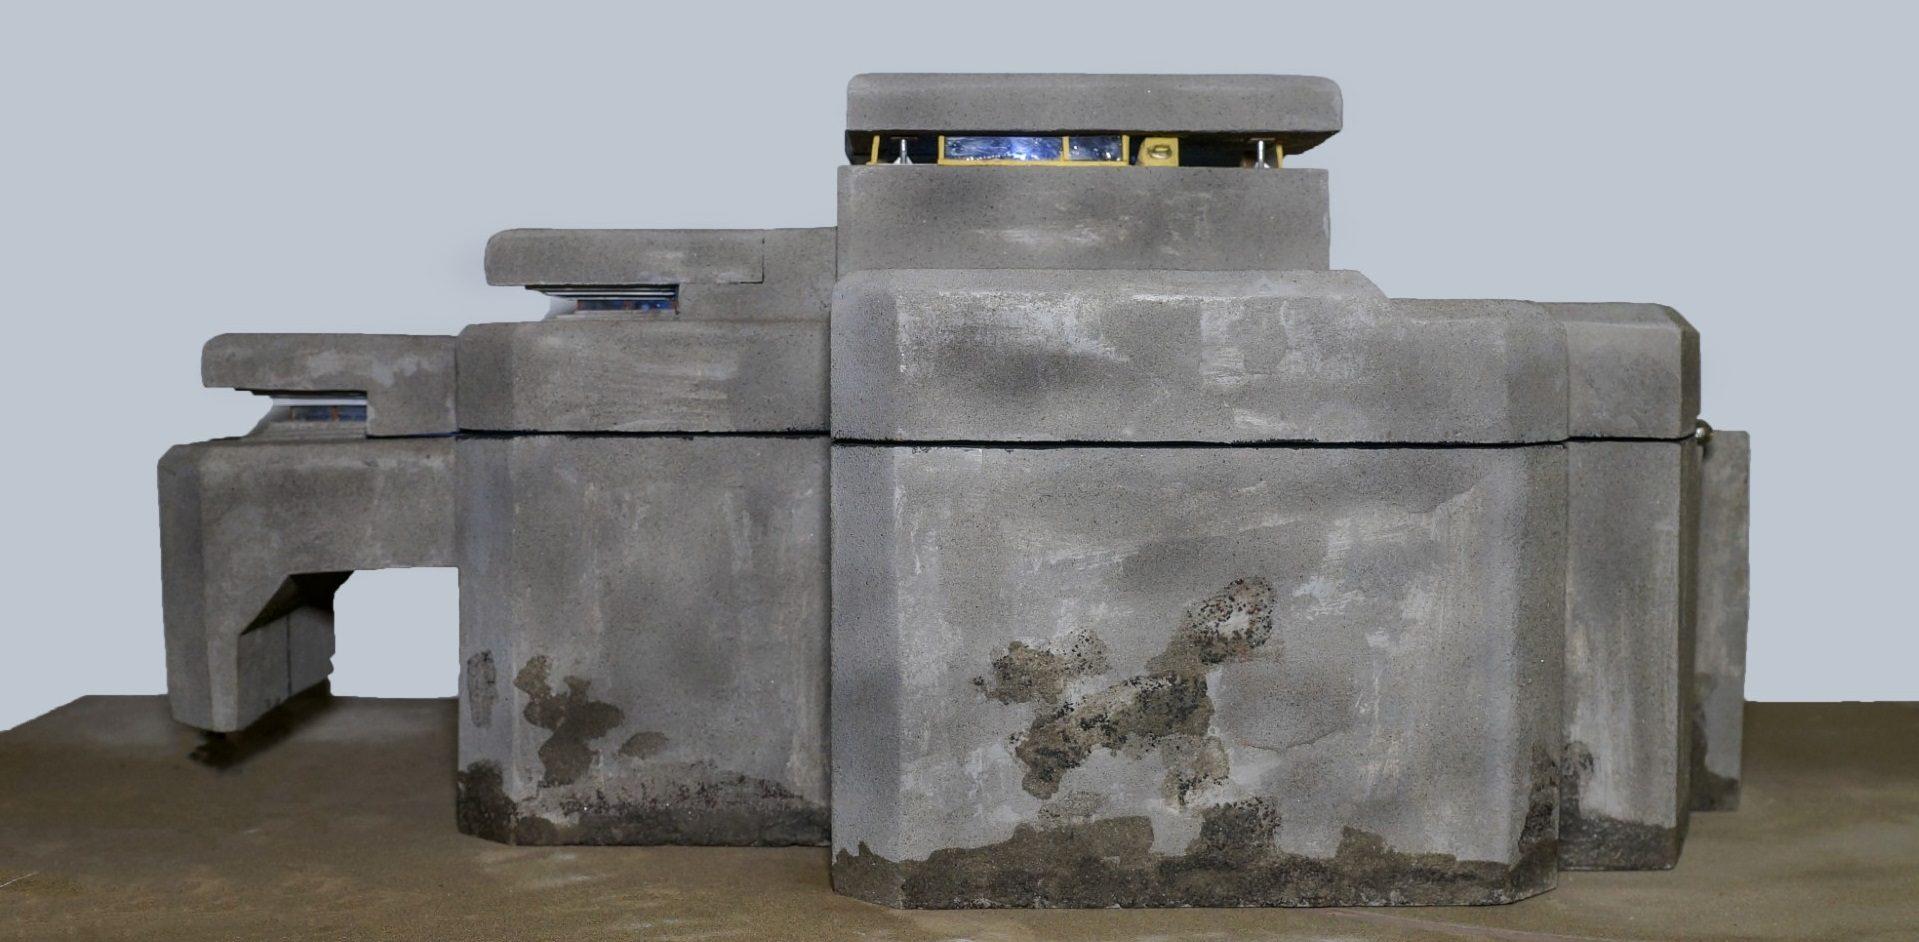 Bunker Atlantikwall Karte.Welkom Atlantikwall